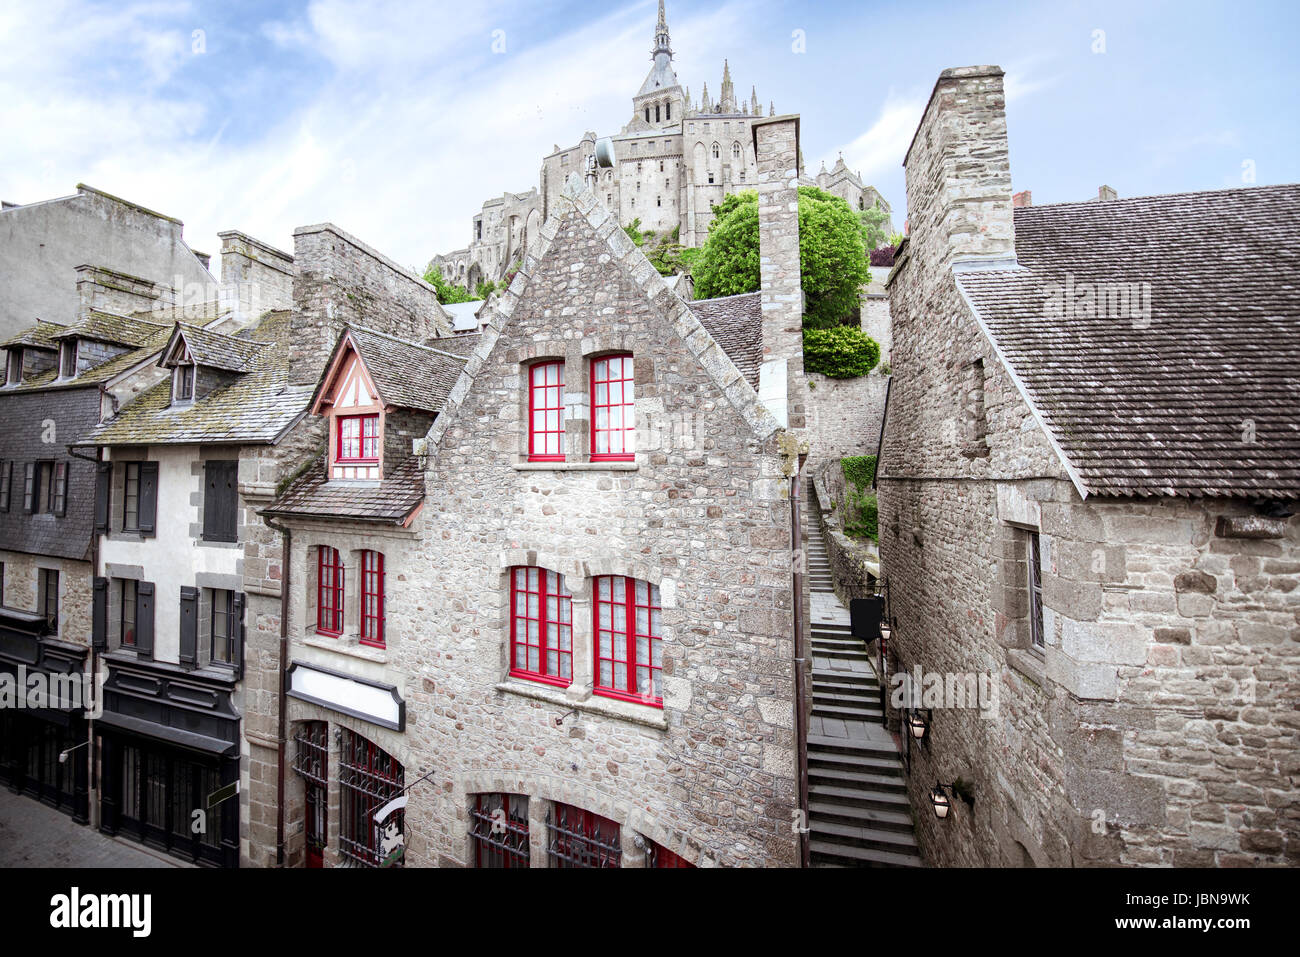 Buildings on the Mont Saint Michel island - Stock Image